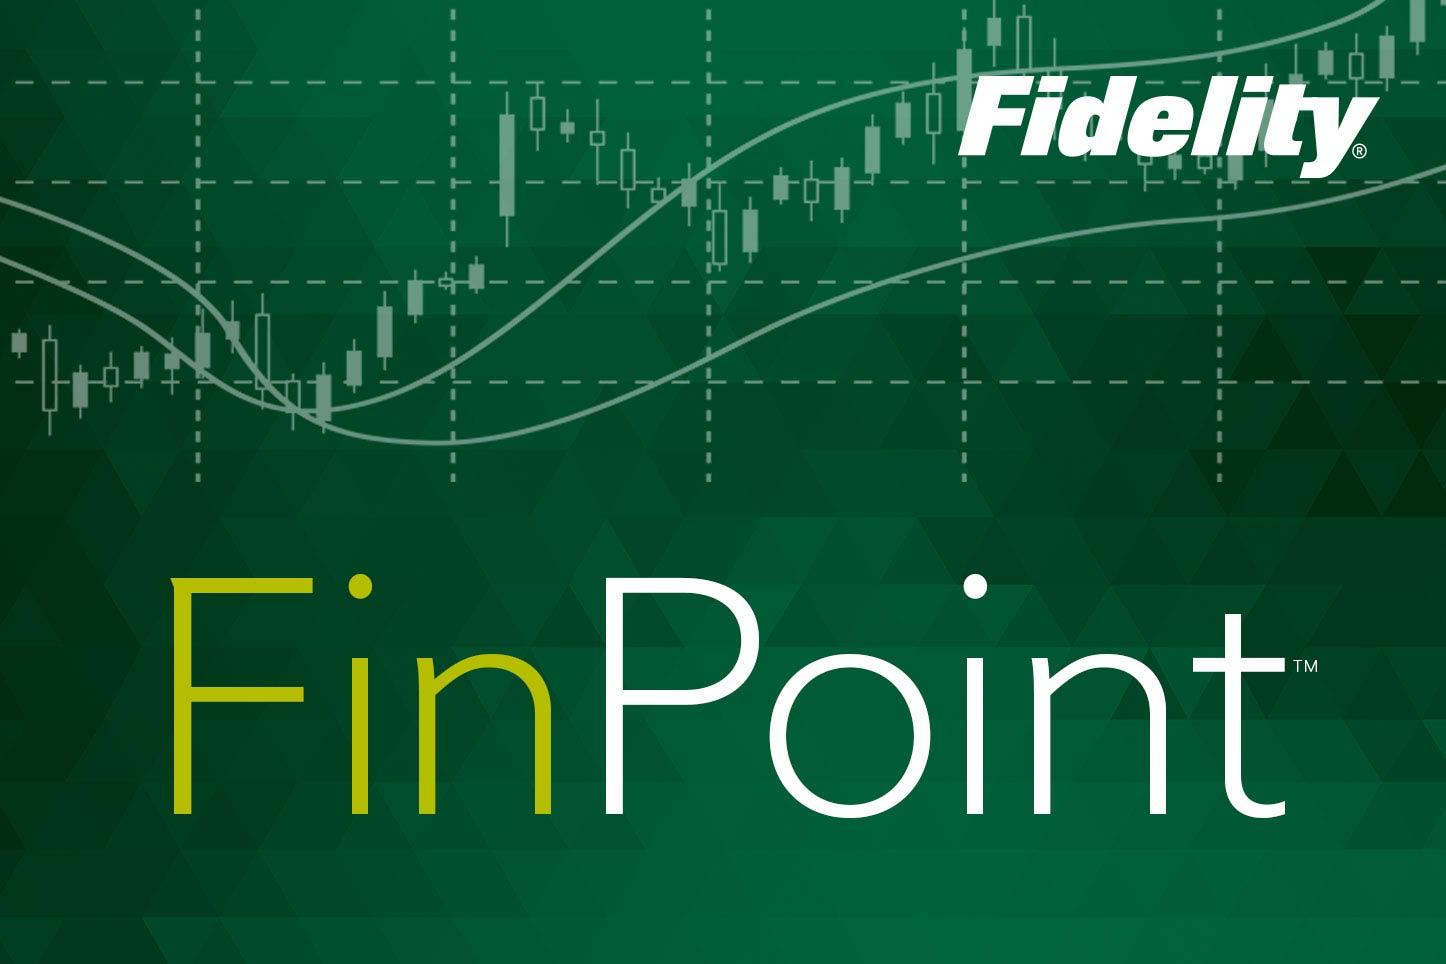 Fidelity Institutional Asset Management